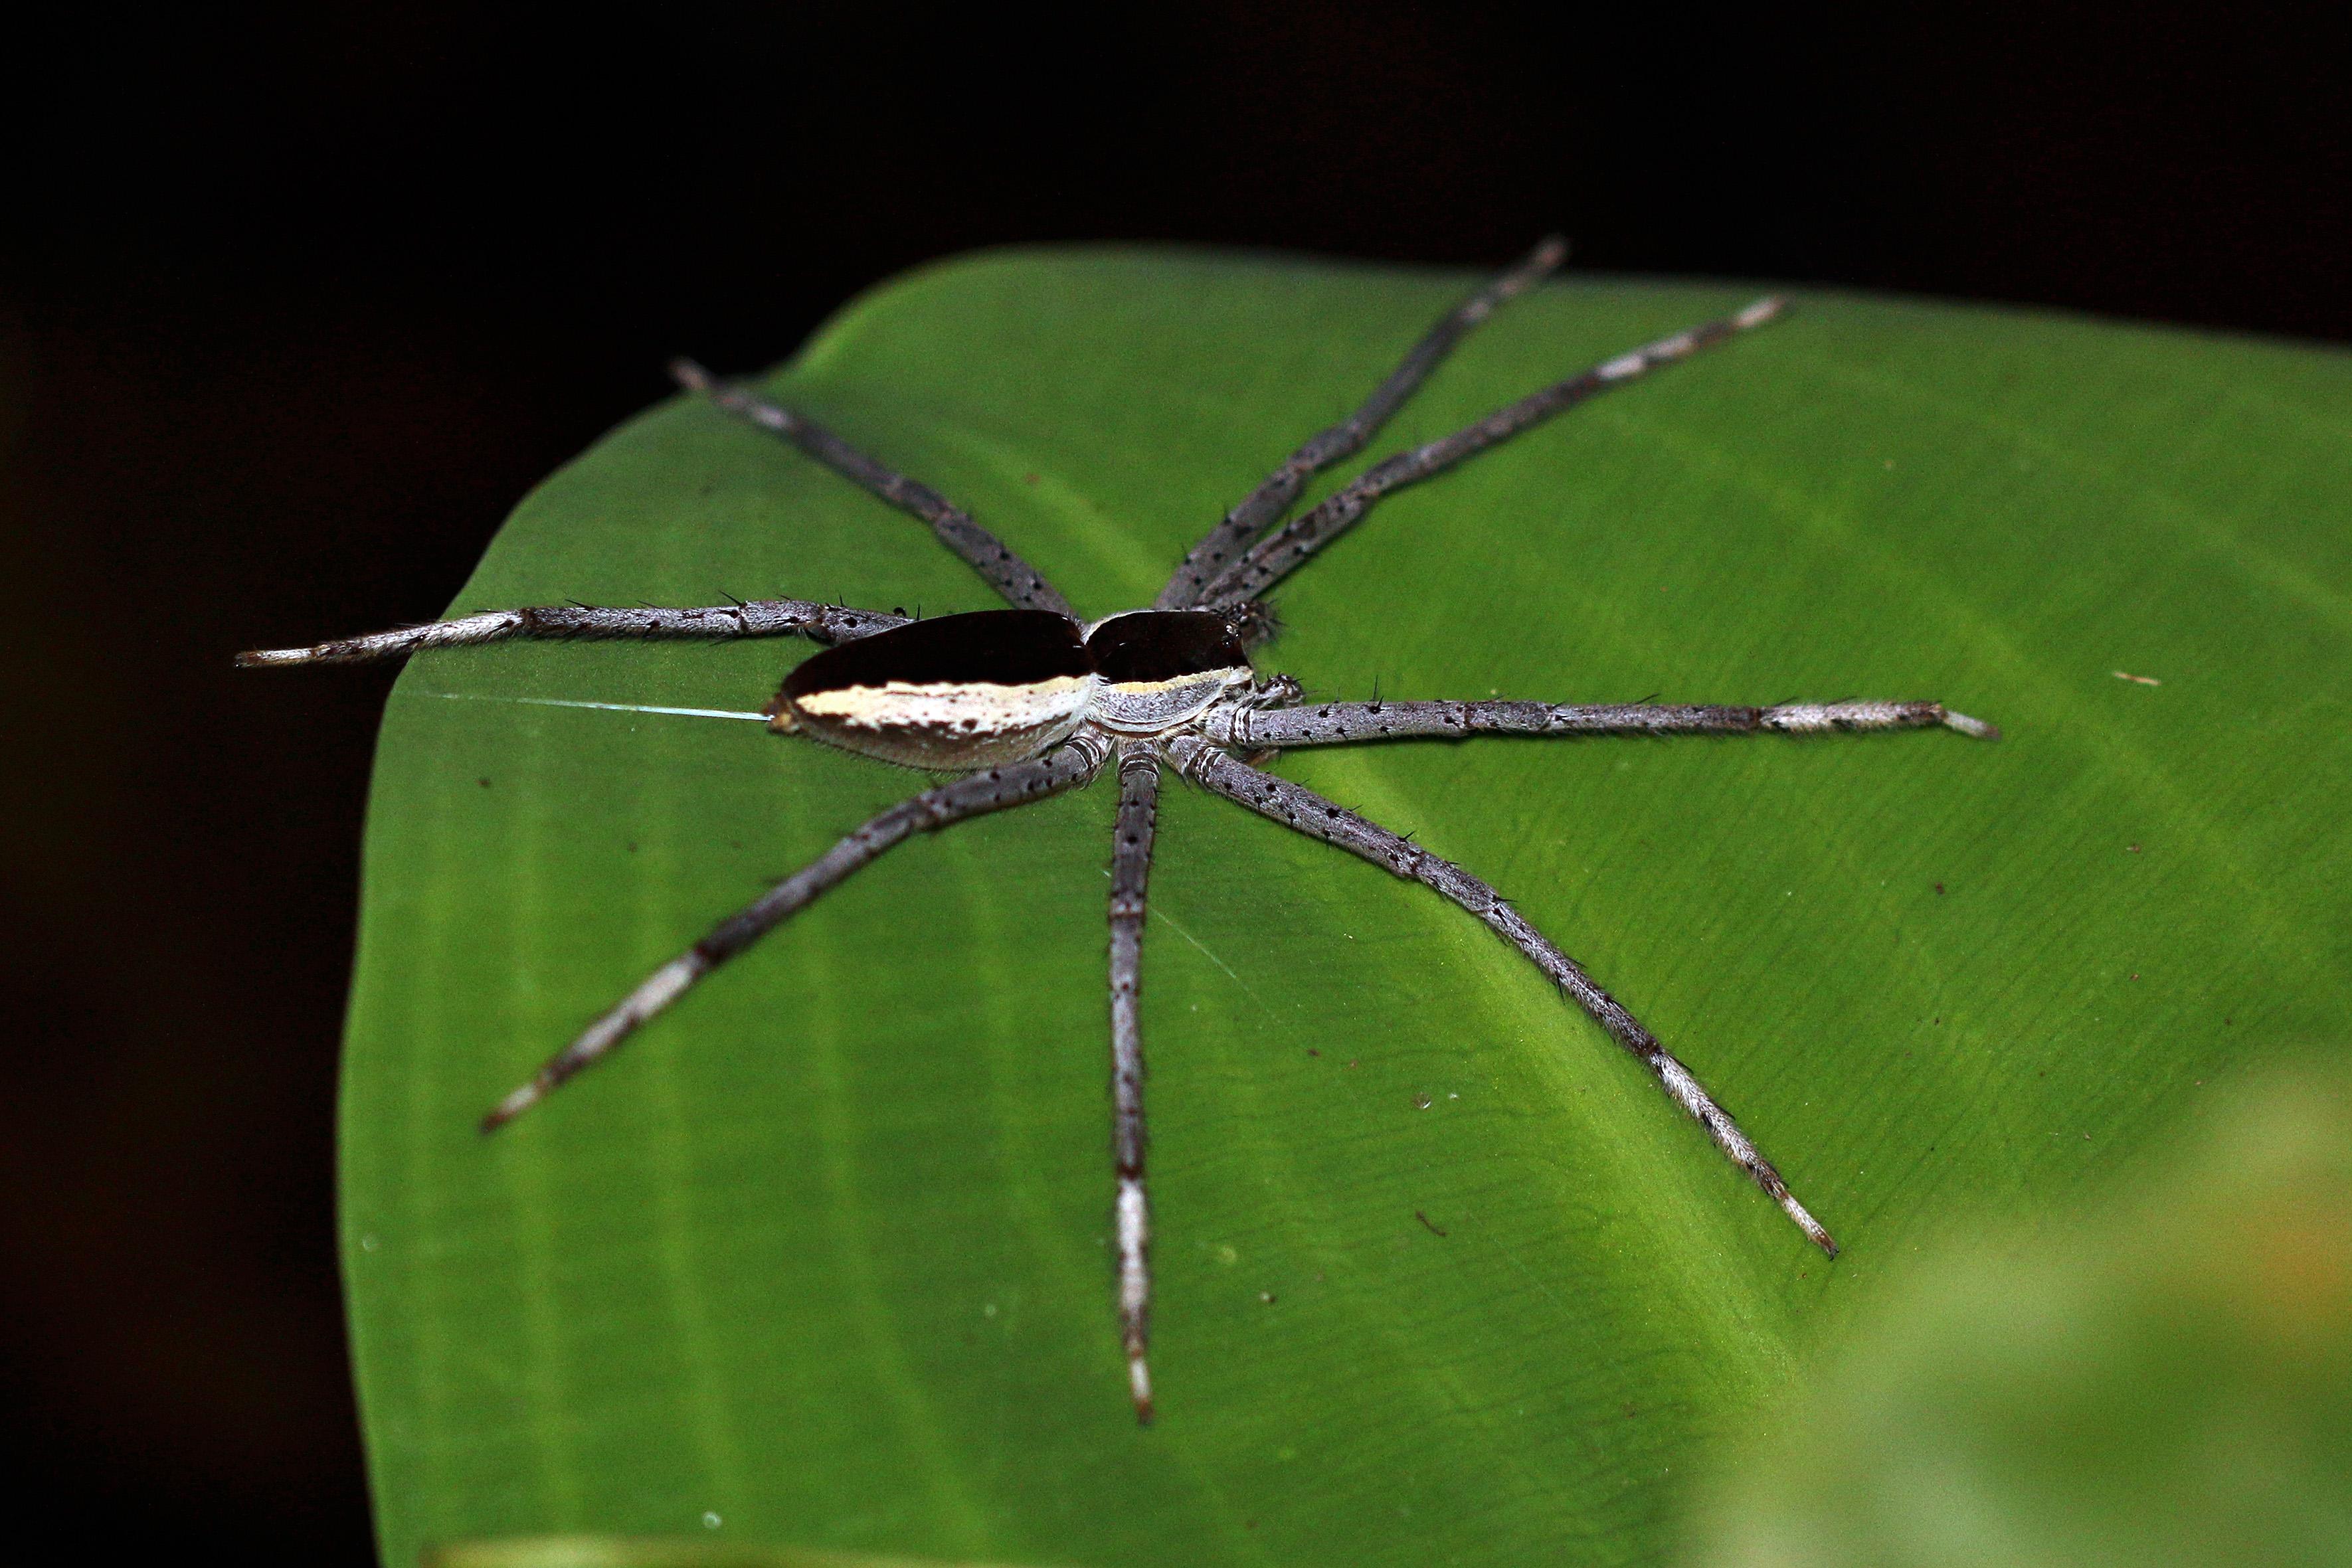 Nursery web spider - Wikipedia